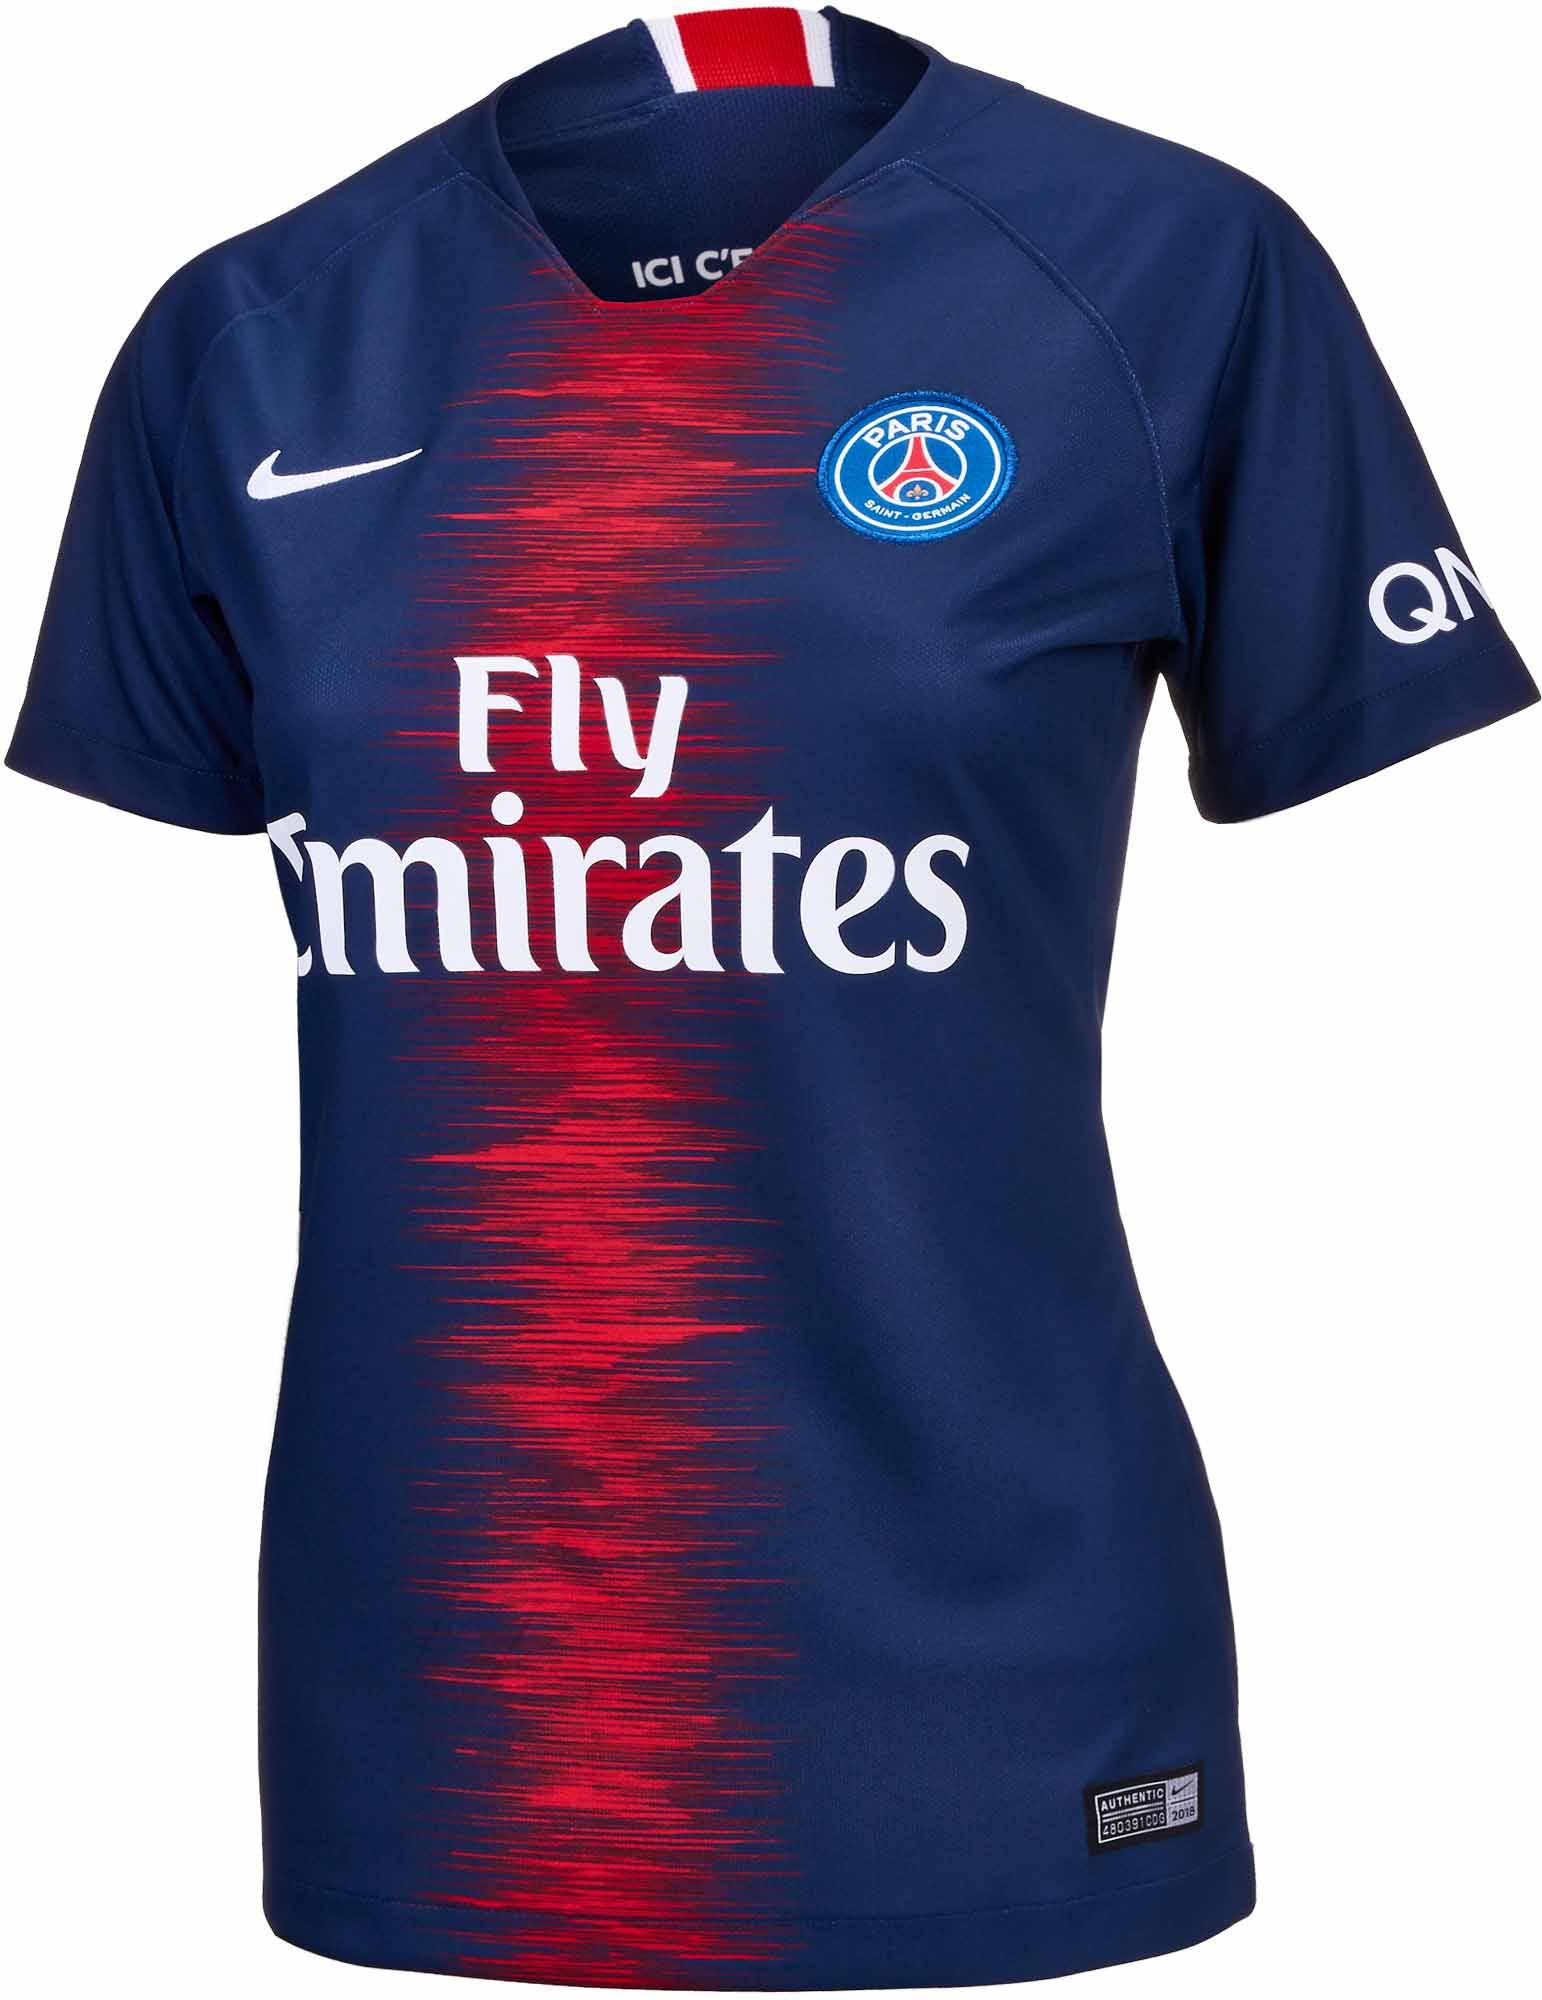 05912fdb957 Nike PSG Home Jersey - Womens 2018-19 - Cleatsxp